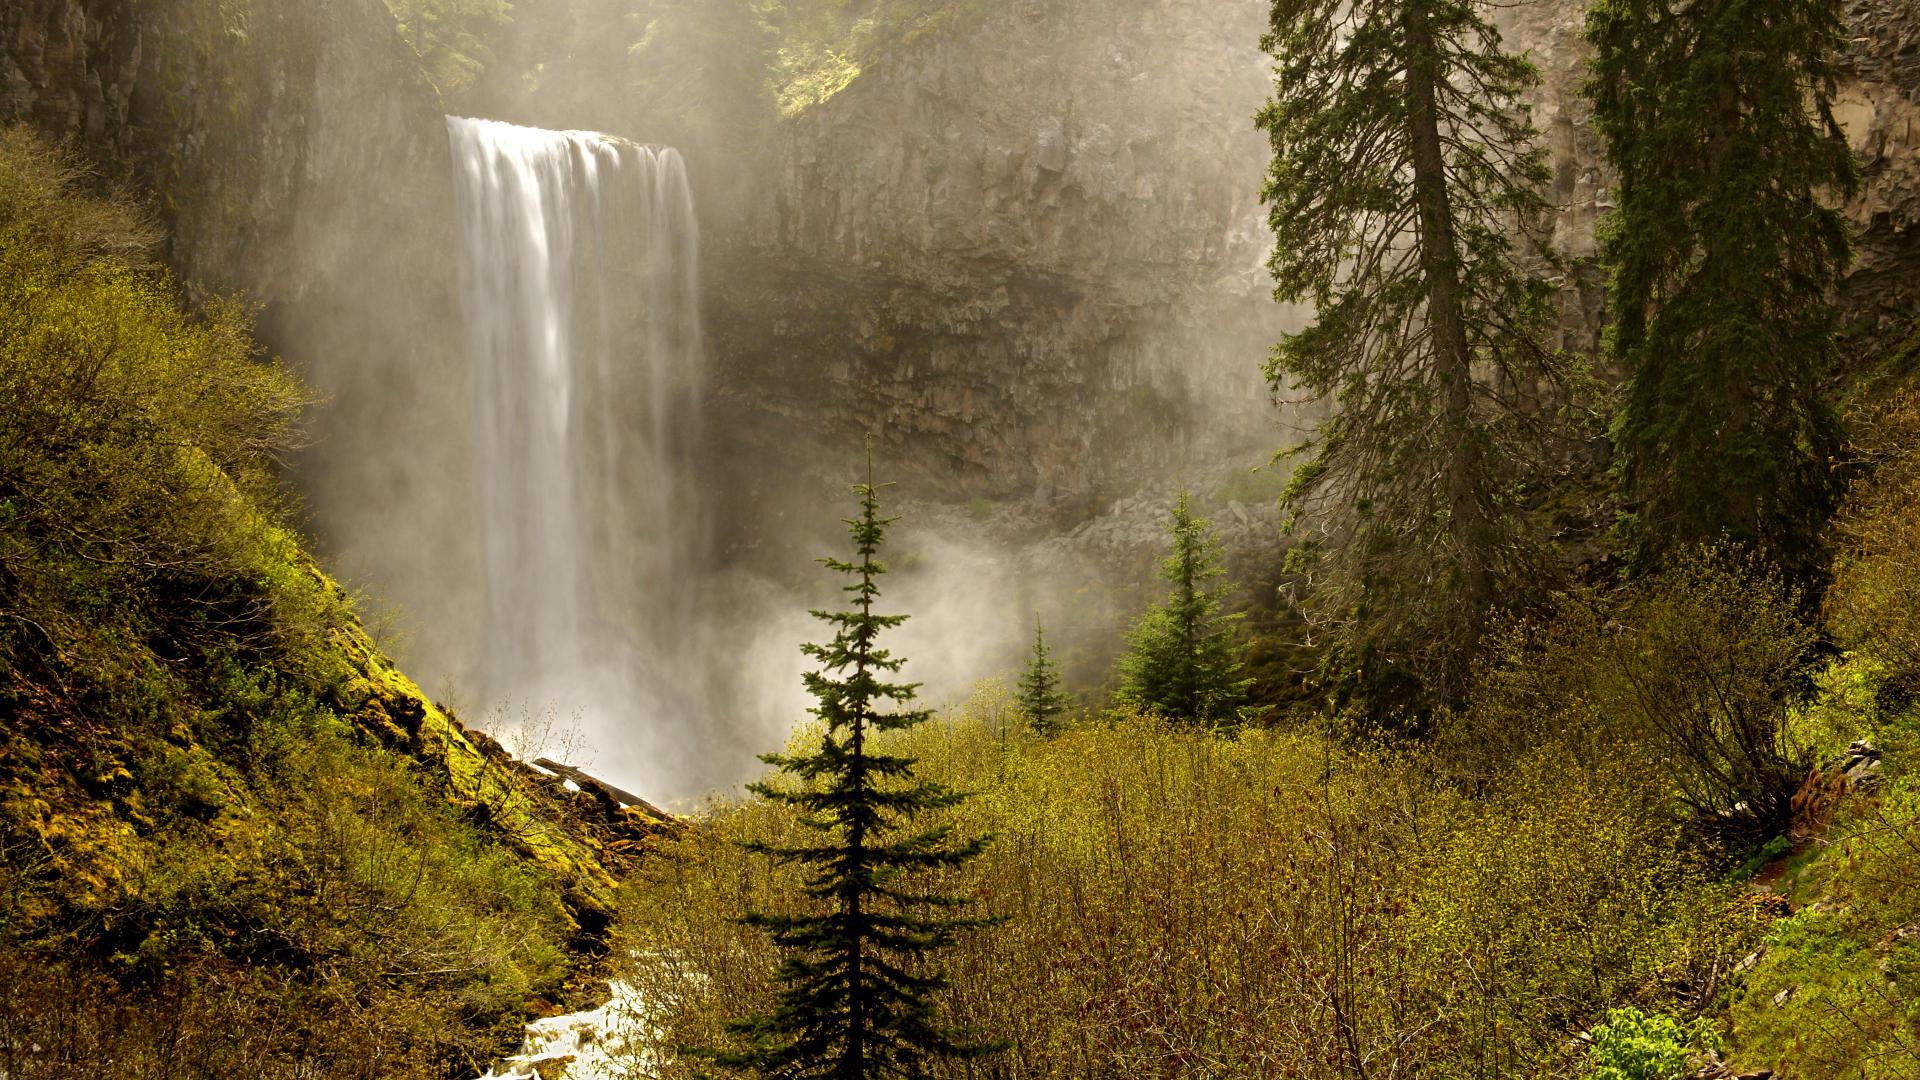 Waterfalls Wallpaper Nice - HD Desktop Wallpapers